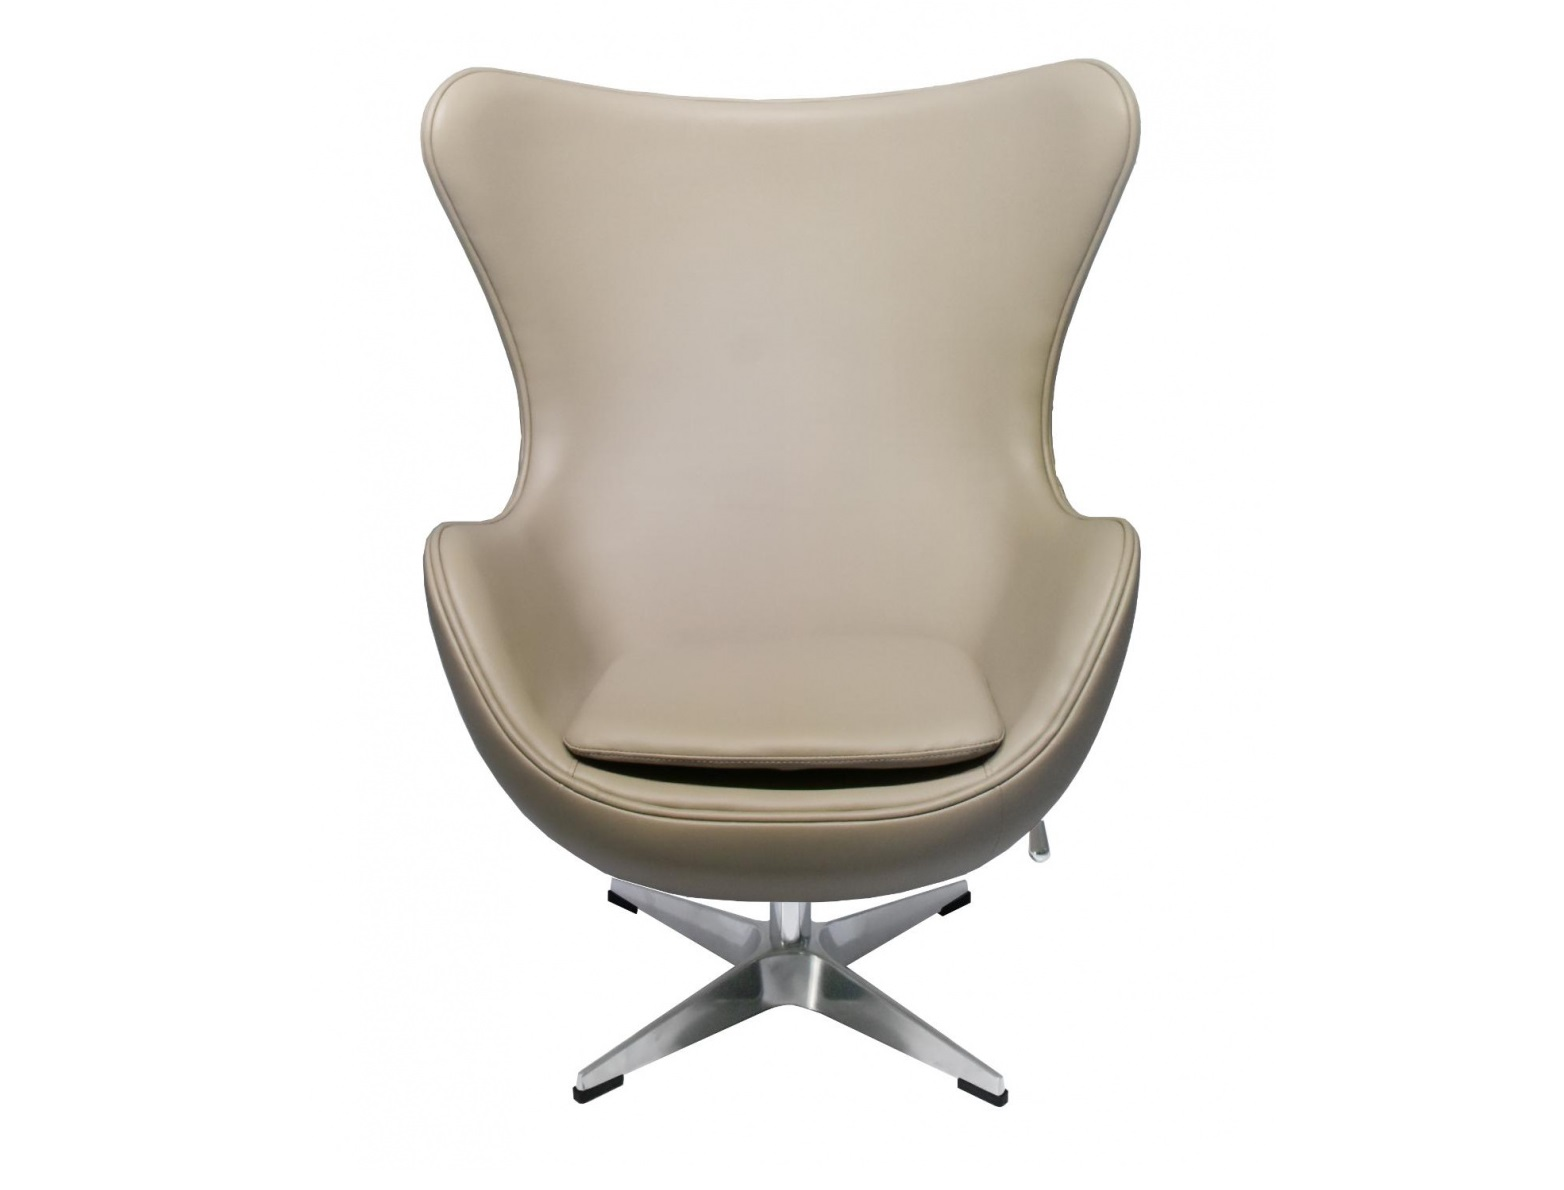 Кресло egg chair (bradexhome) бежевый 76x110x77 см.